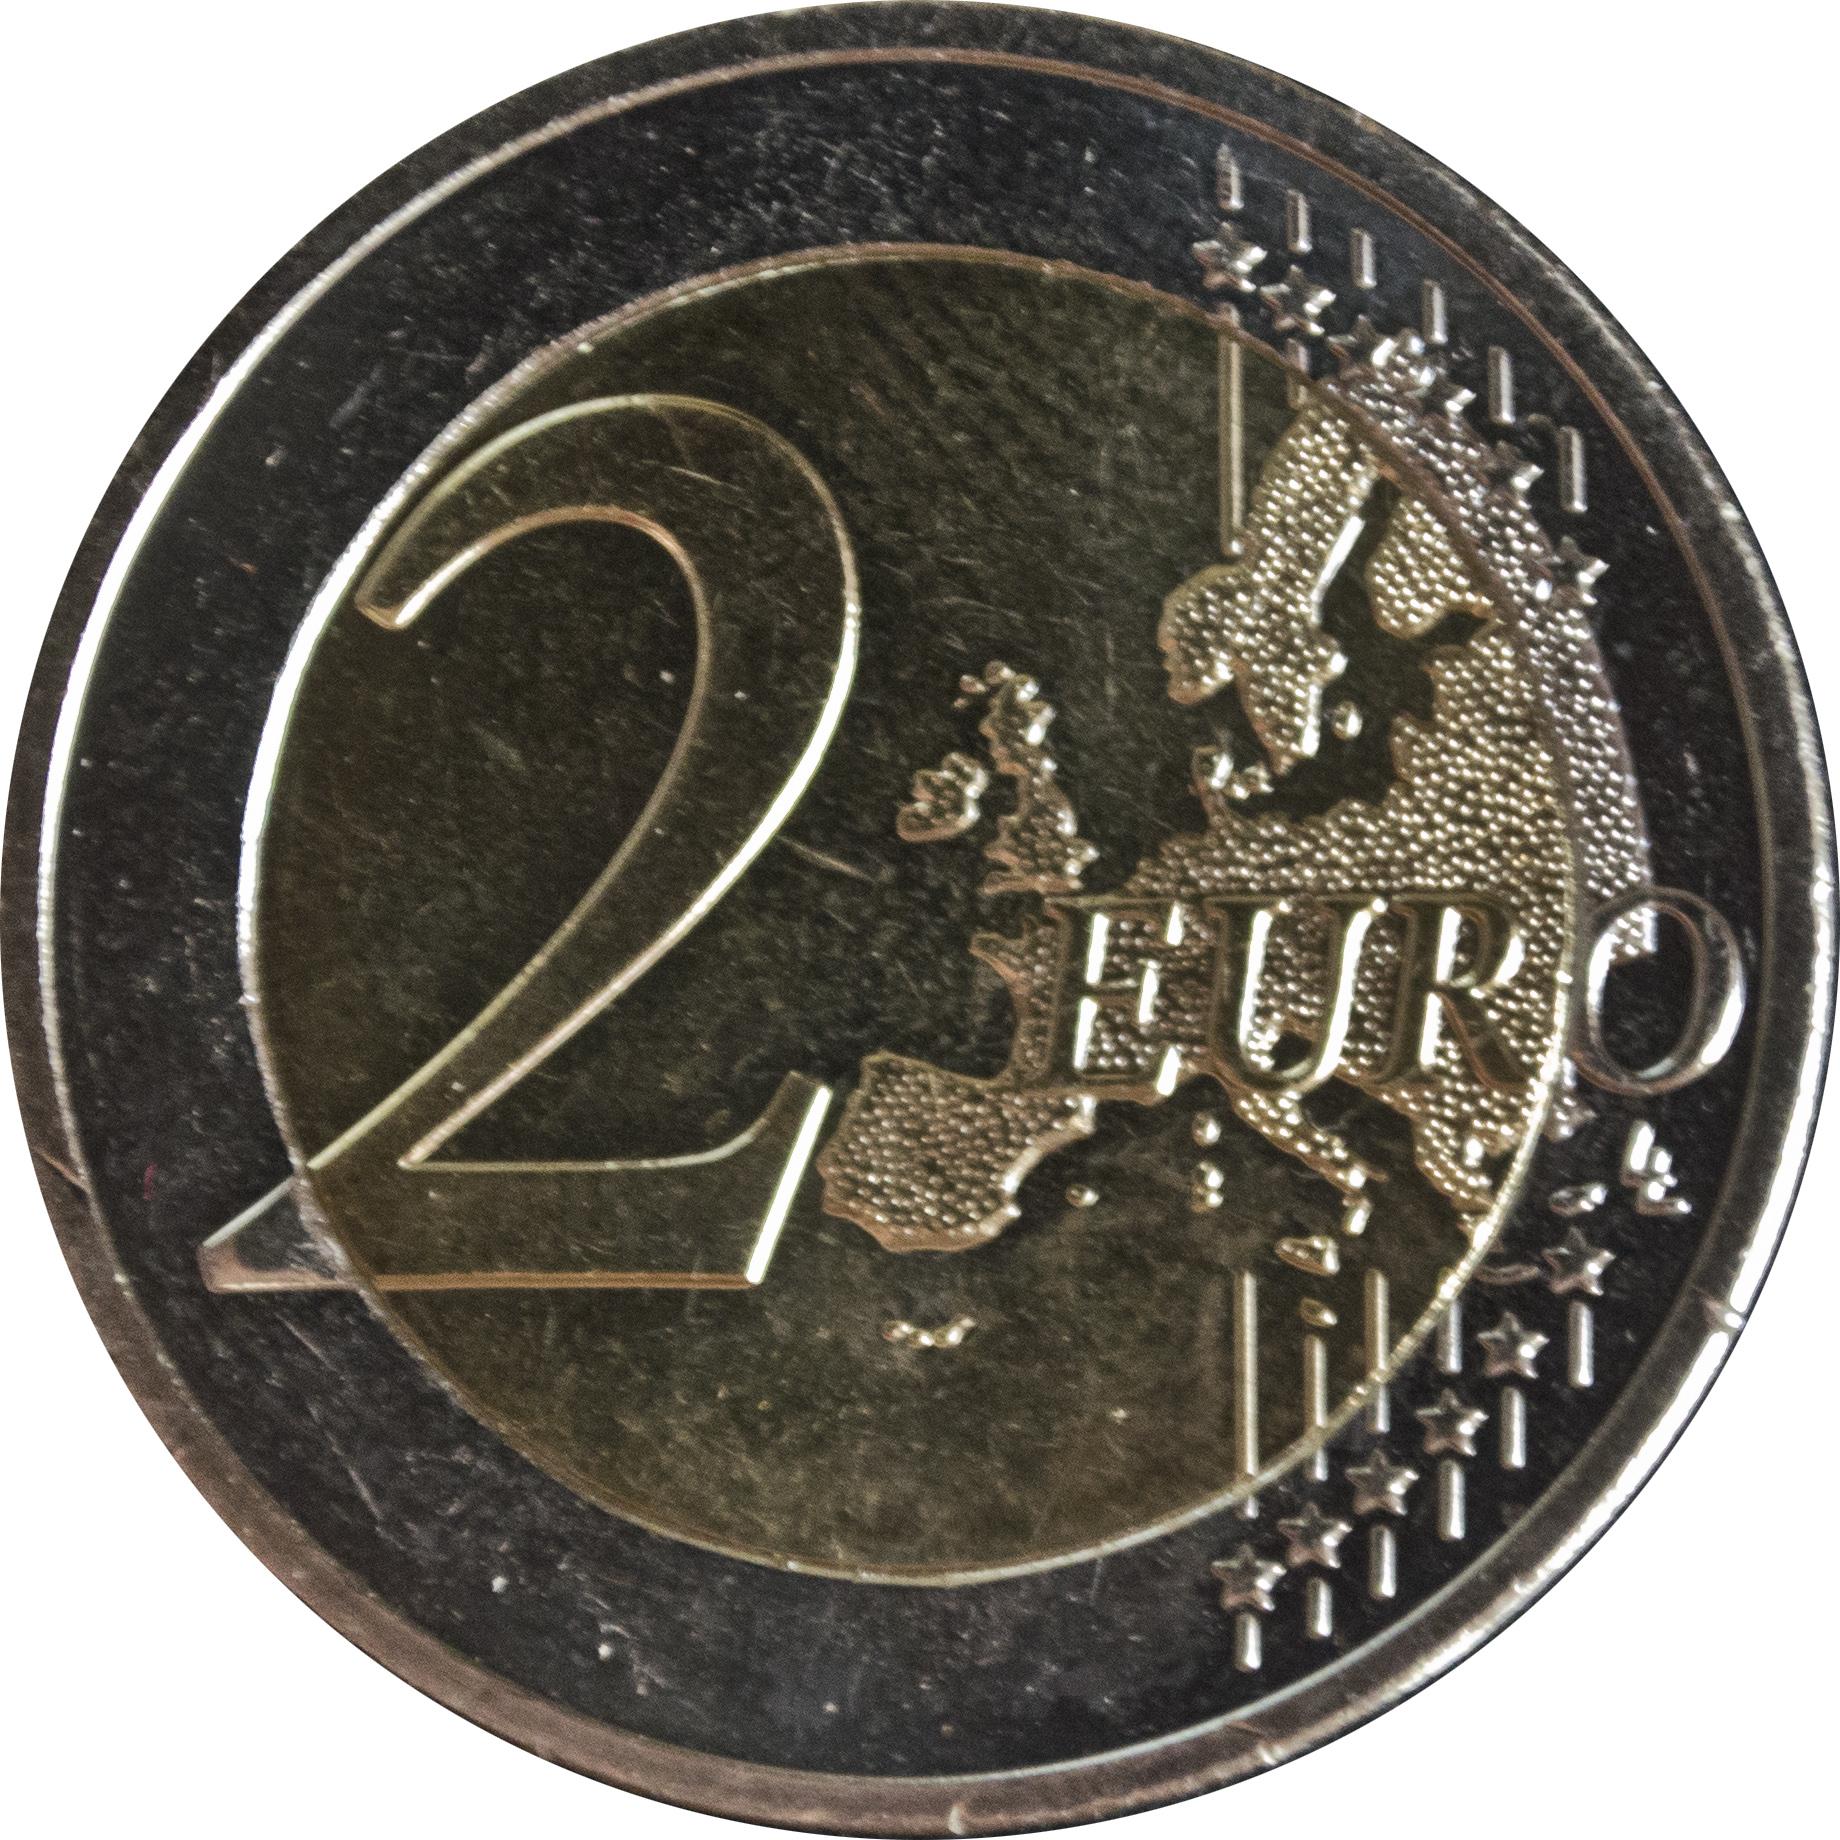 "Greece 2 euro 2013 /""Union of Crete with Greece/"" BiMetallic UNC"